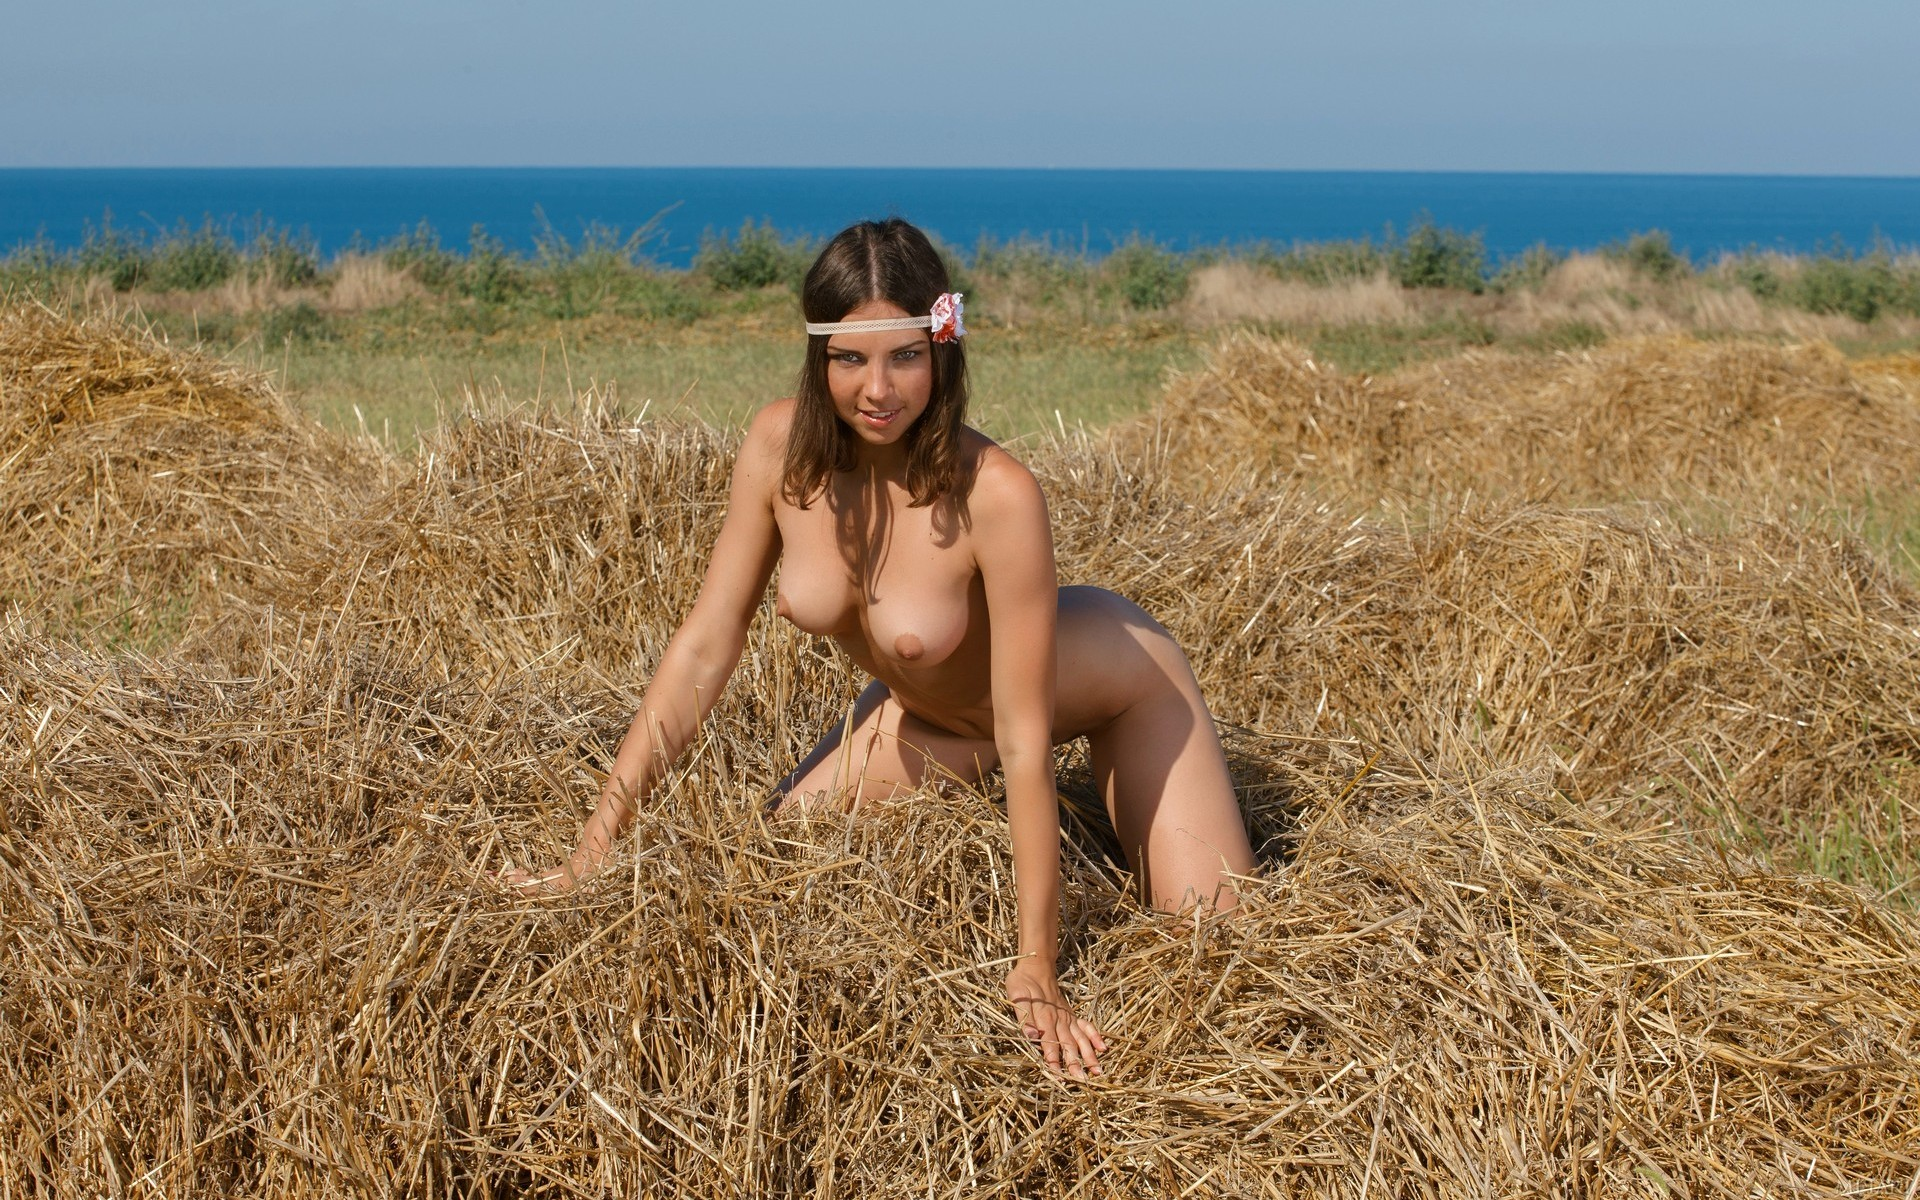 эротика украинские девчата видео - 14